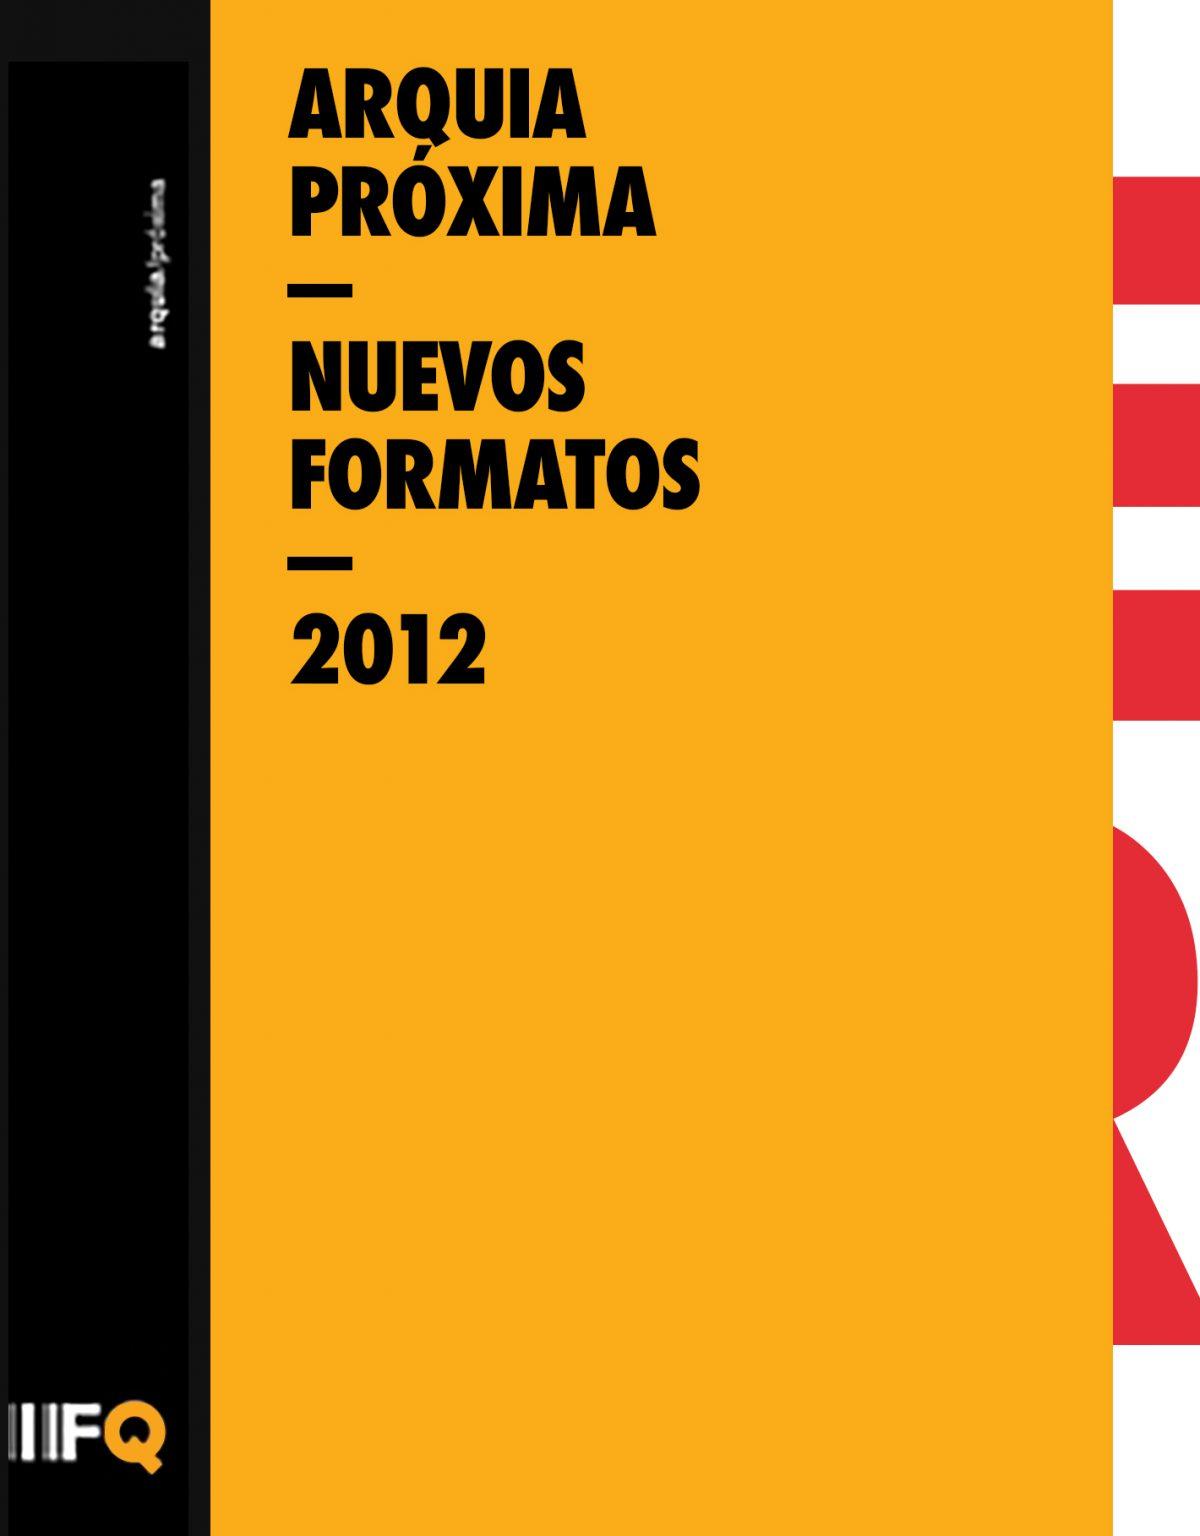 arquia proxima 2012